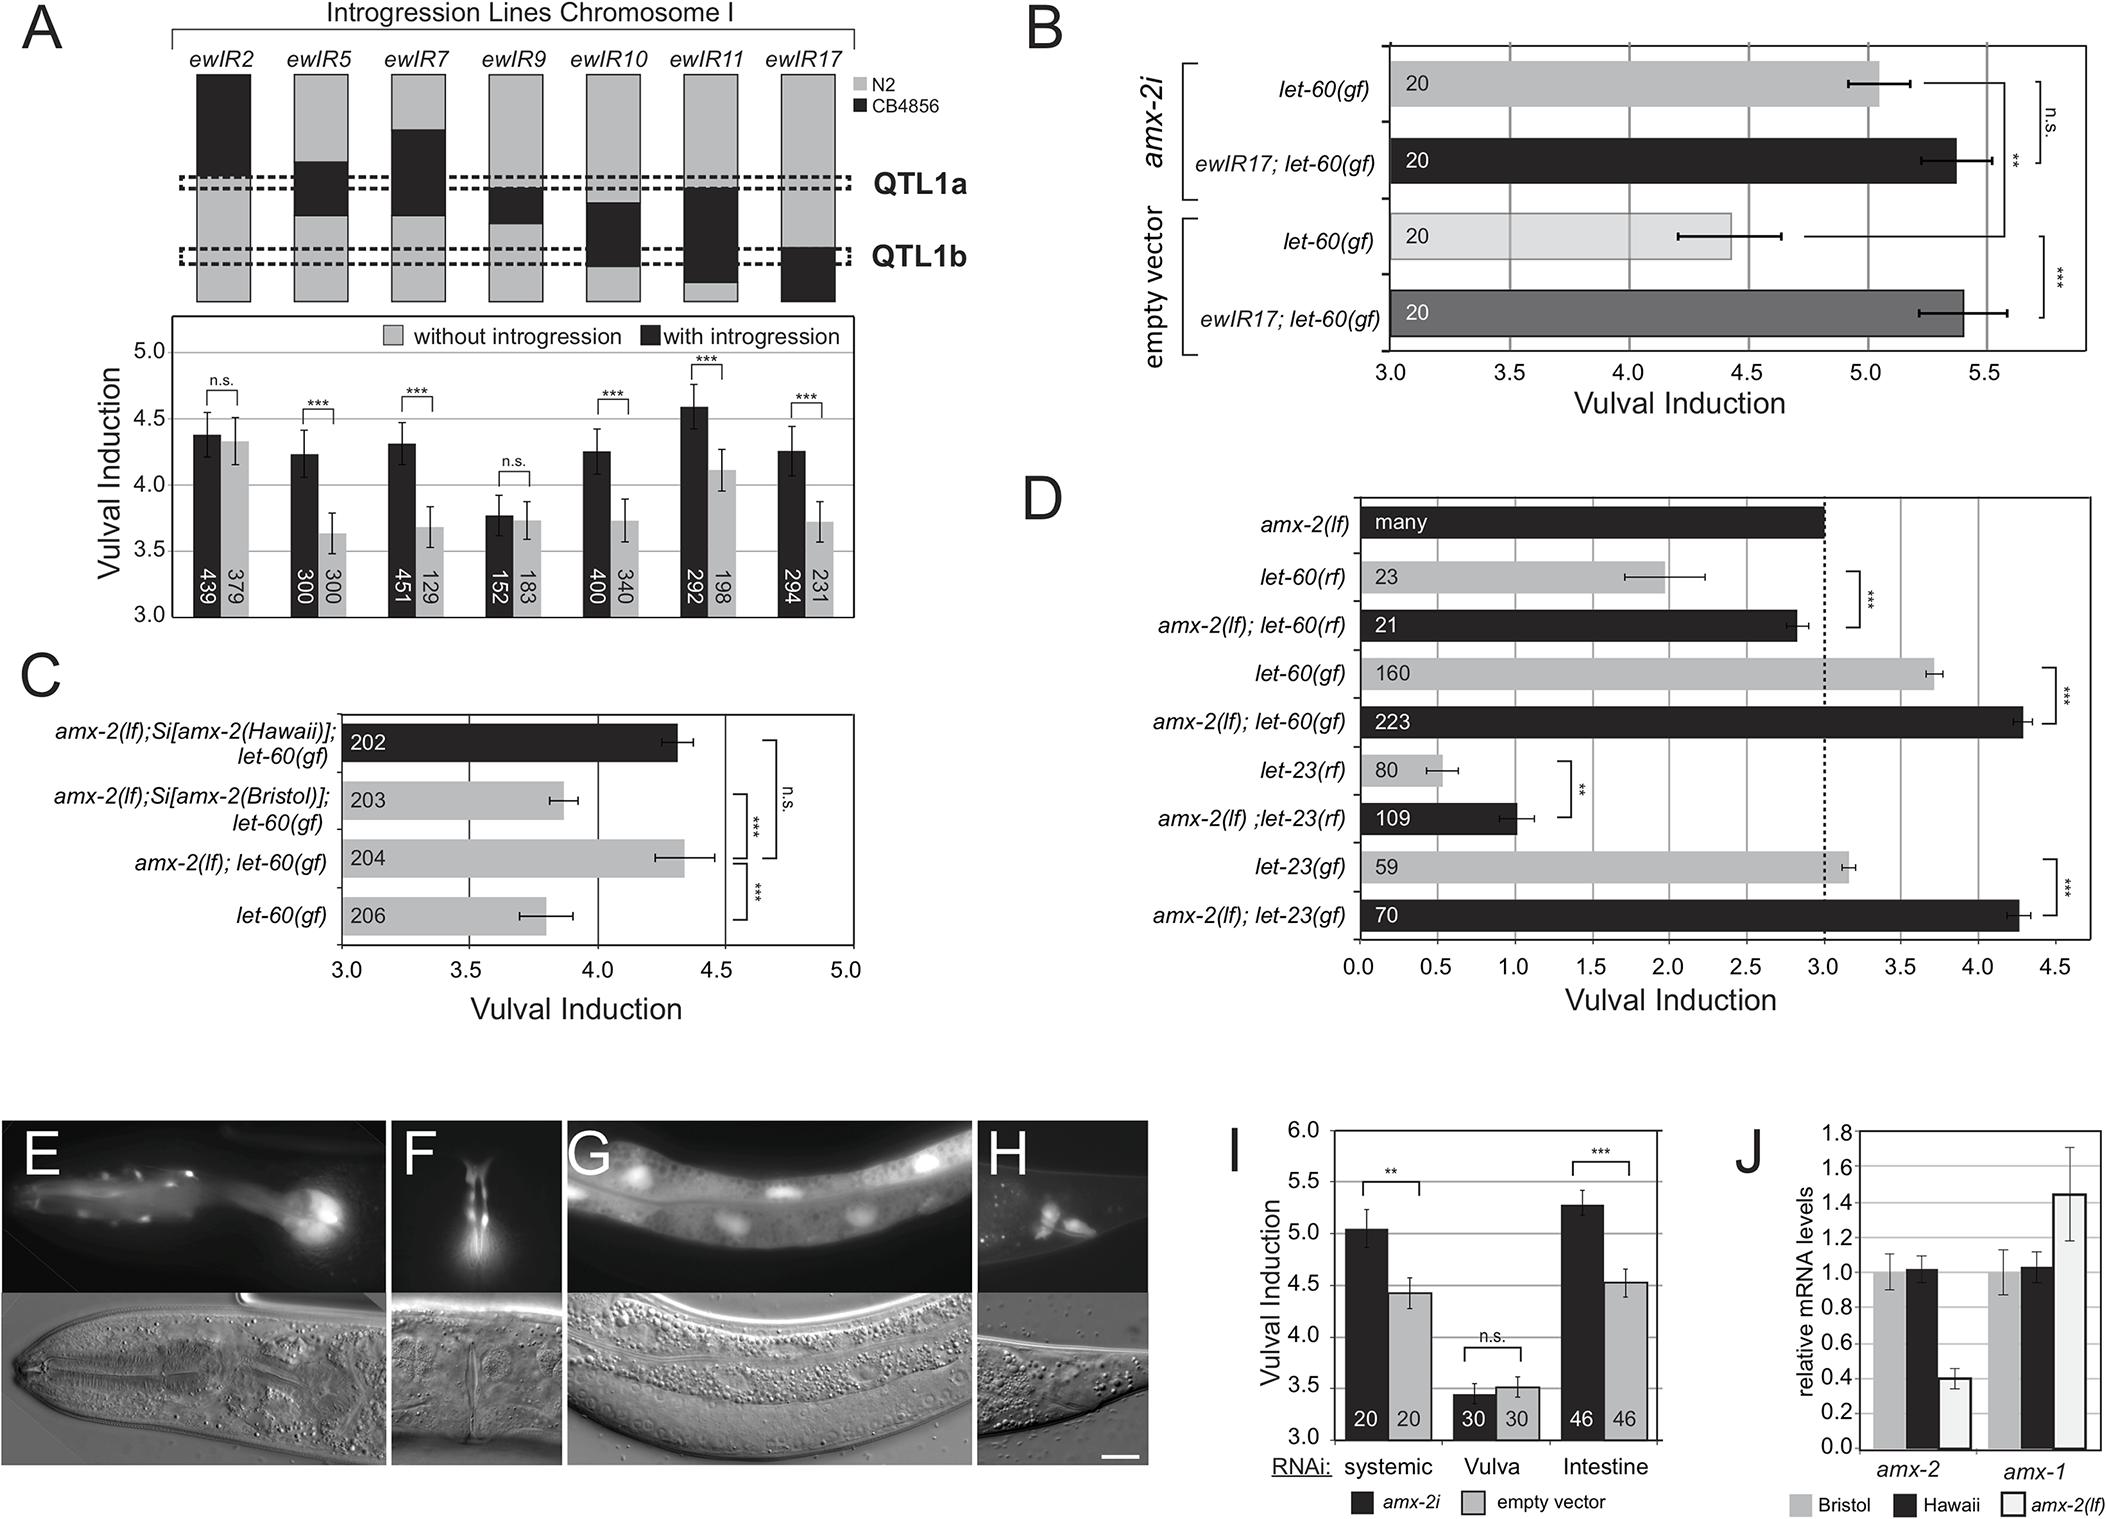 AMX-2 negatively regulates RAS/MAPK signaling.